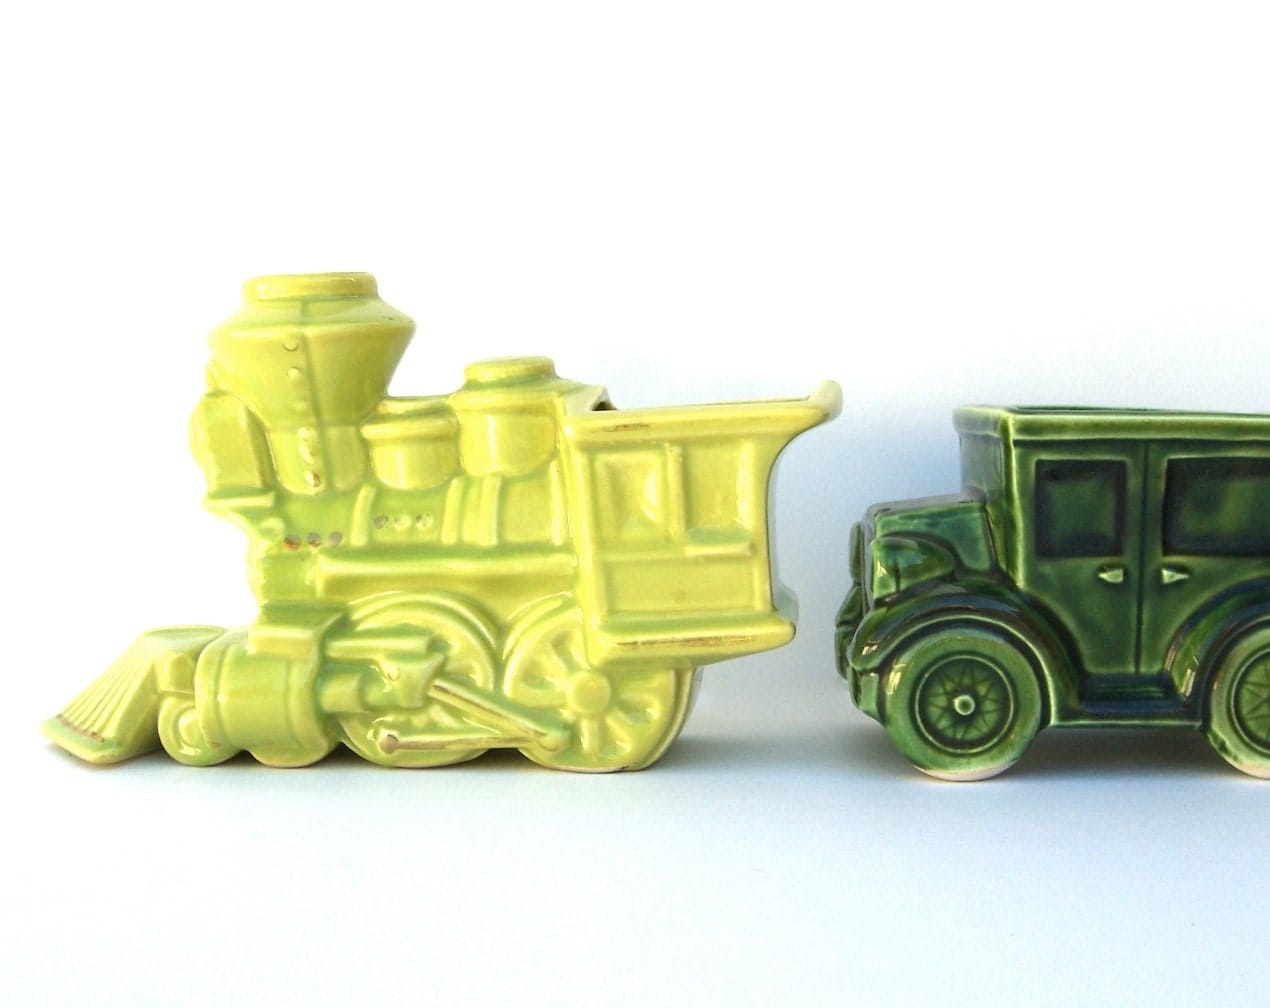 Small Car Planters : Vintage ceramic train and car planter vase nursery boys room